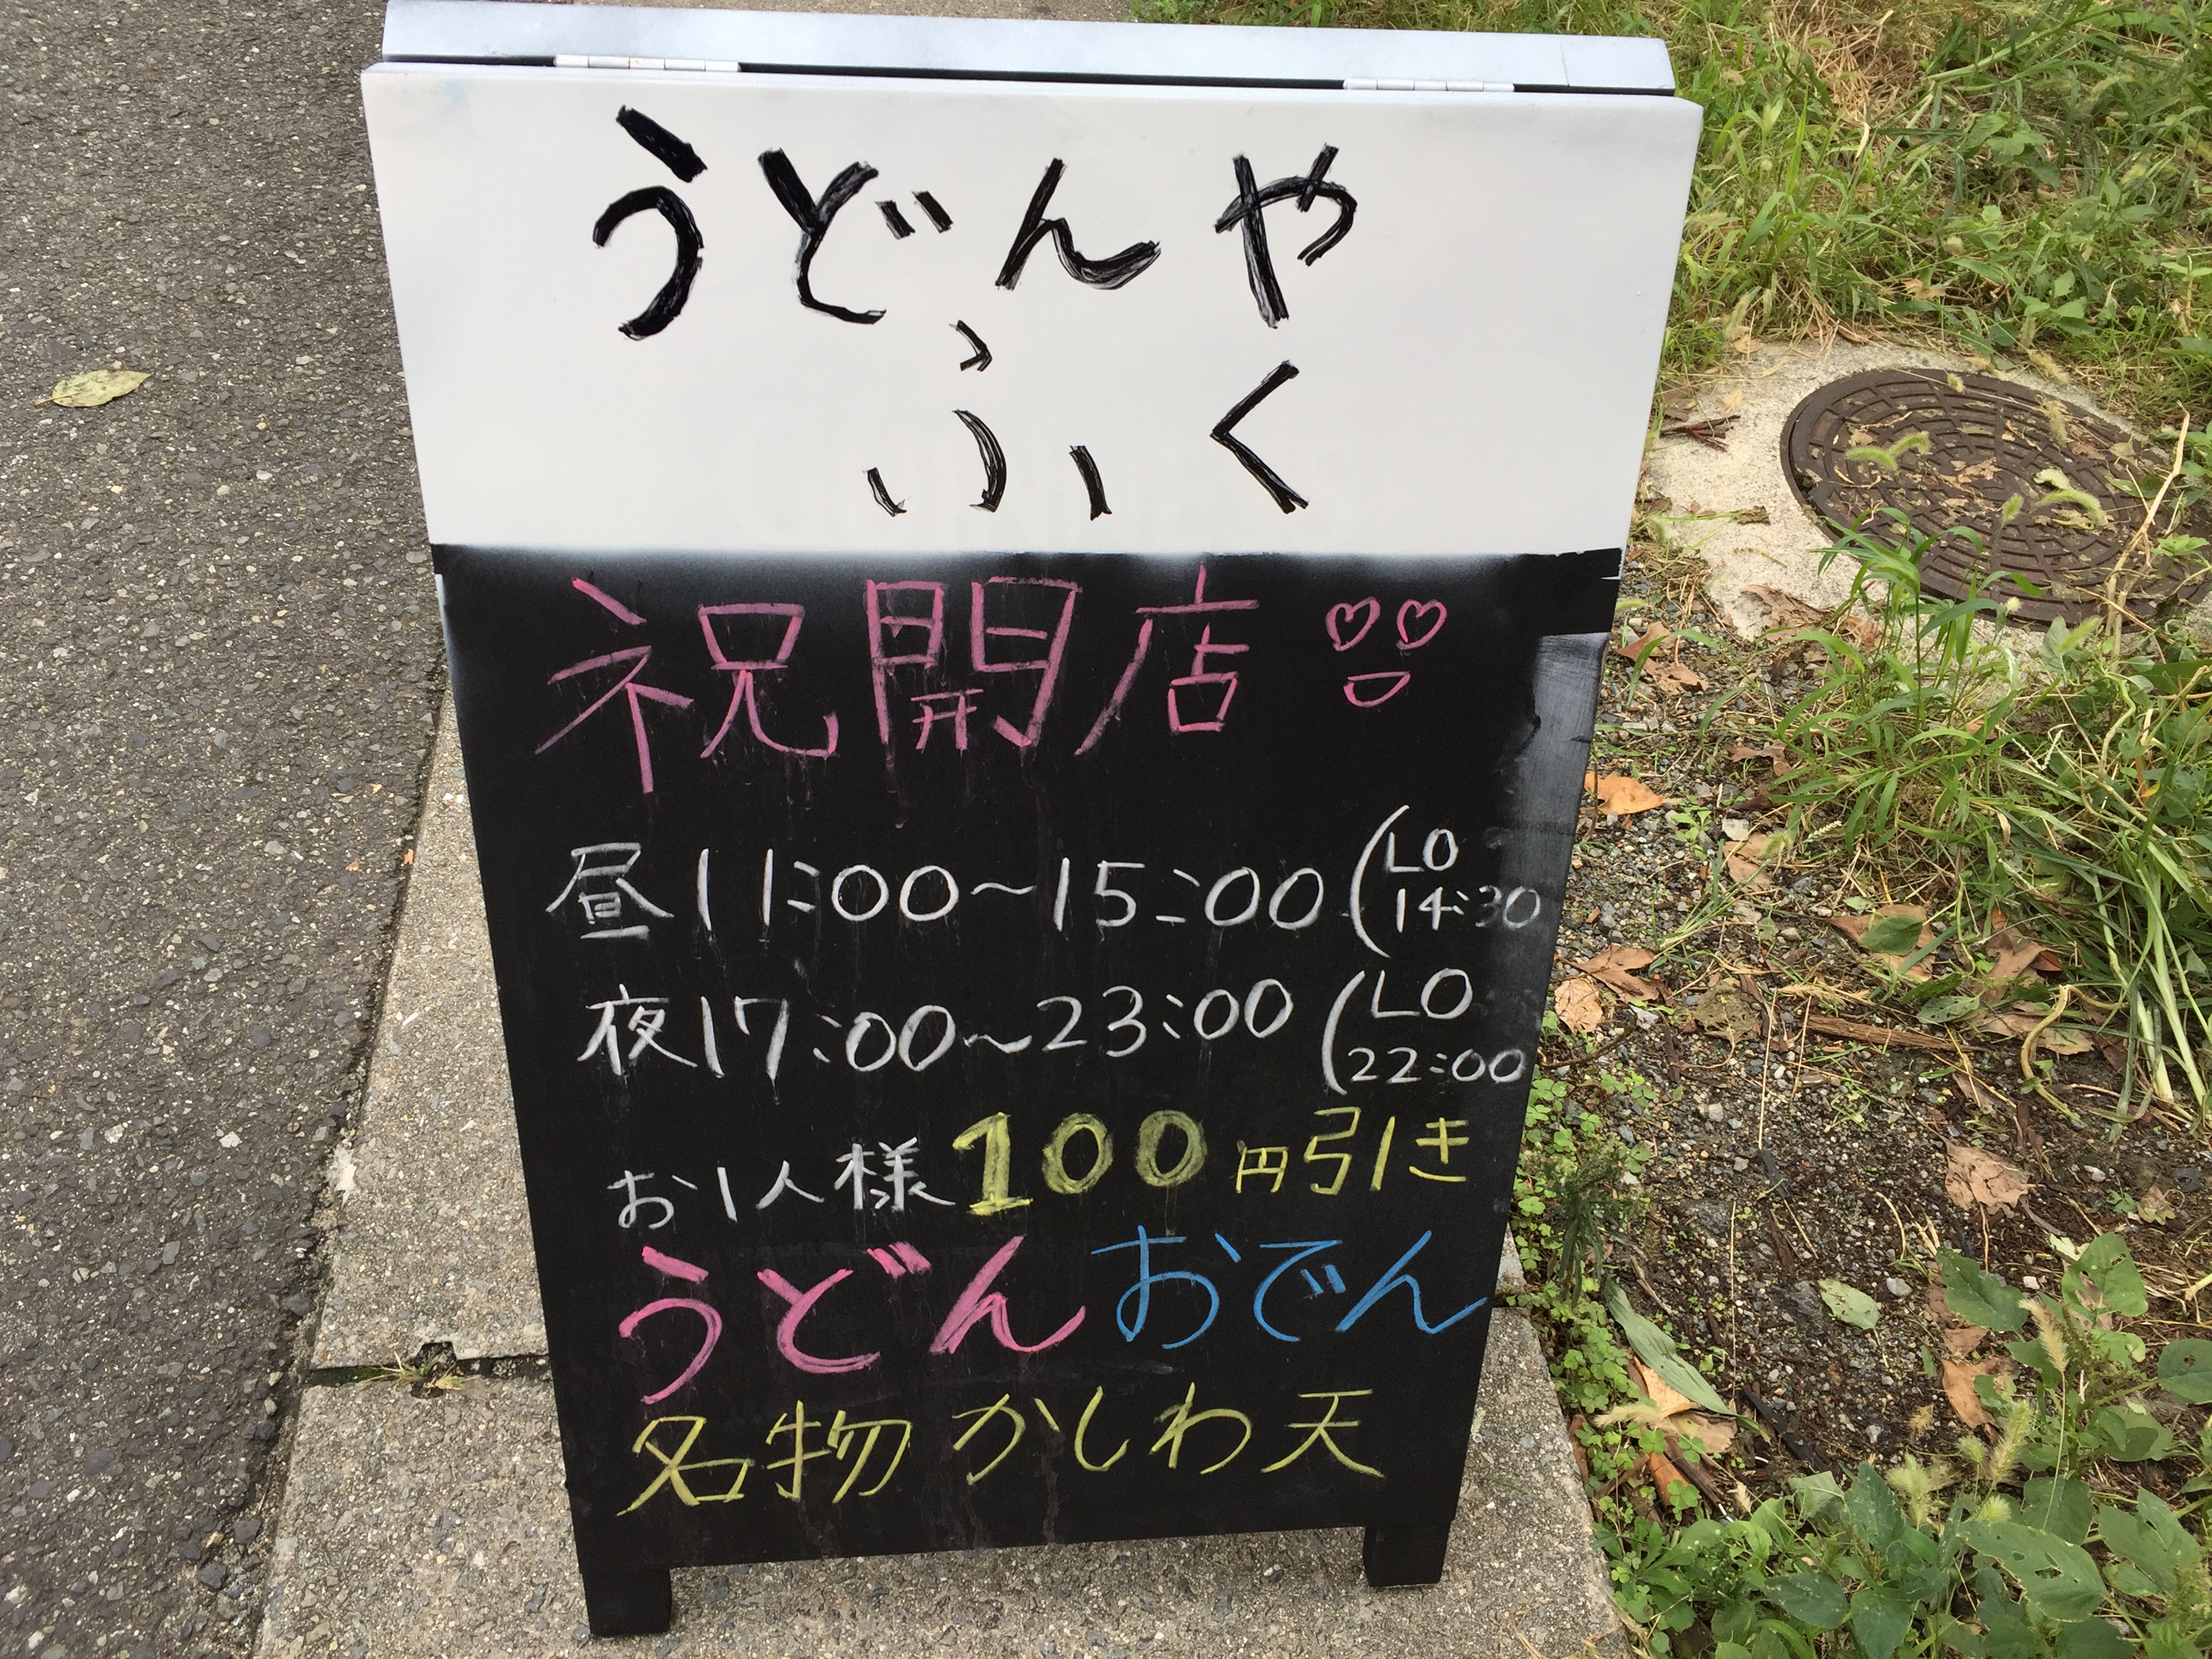 2016-10-04-13-09-53